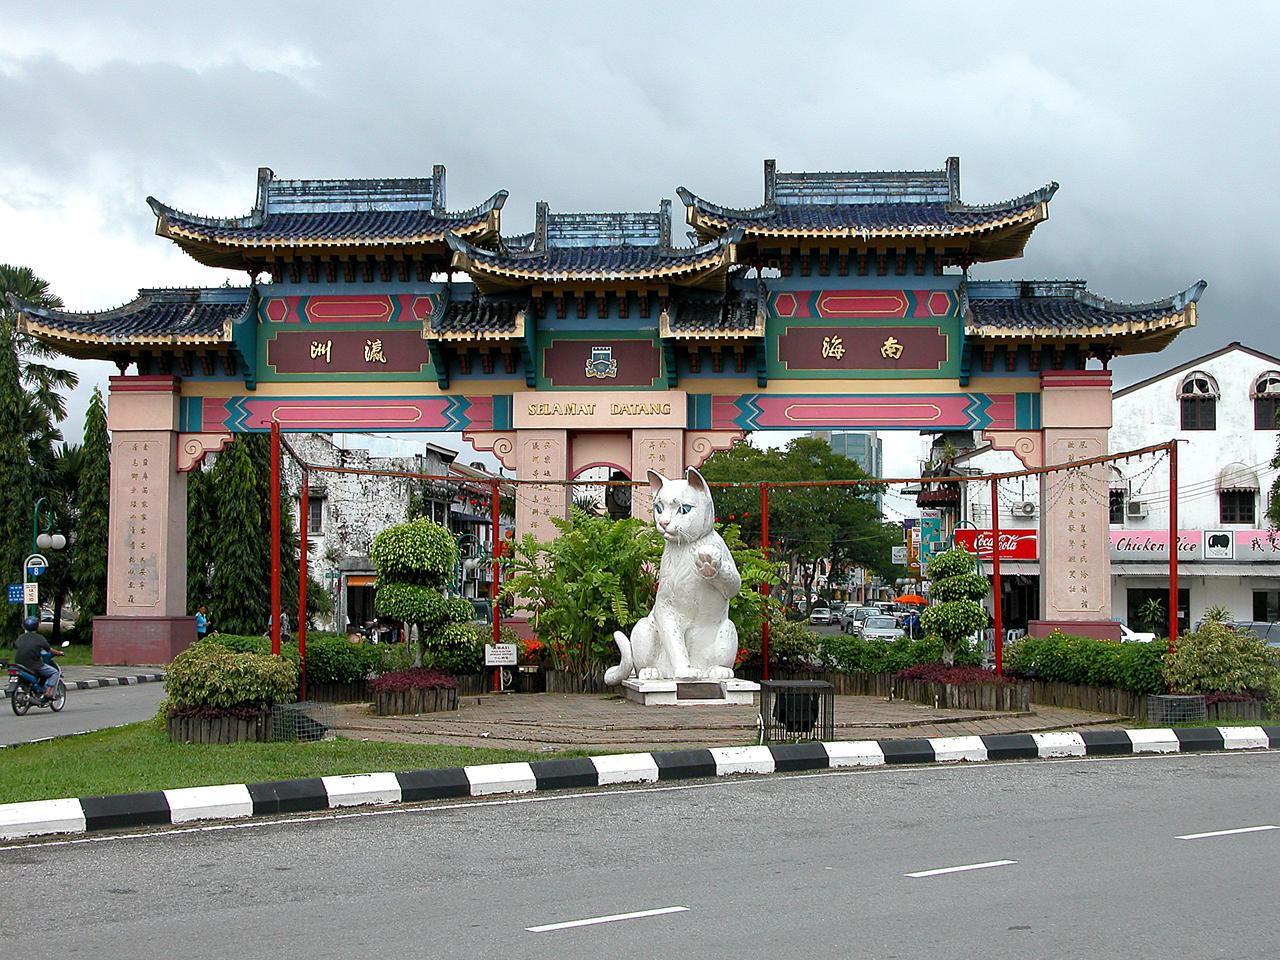 Maleisië, Kuching, de stad van de kat - Sarawak